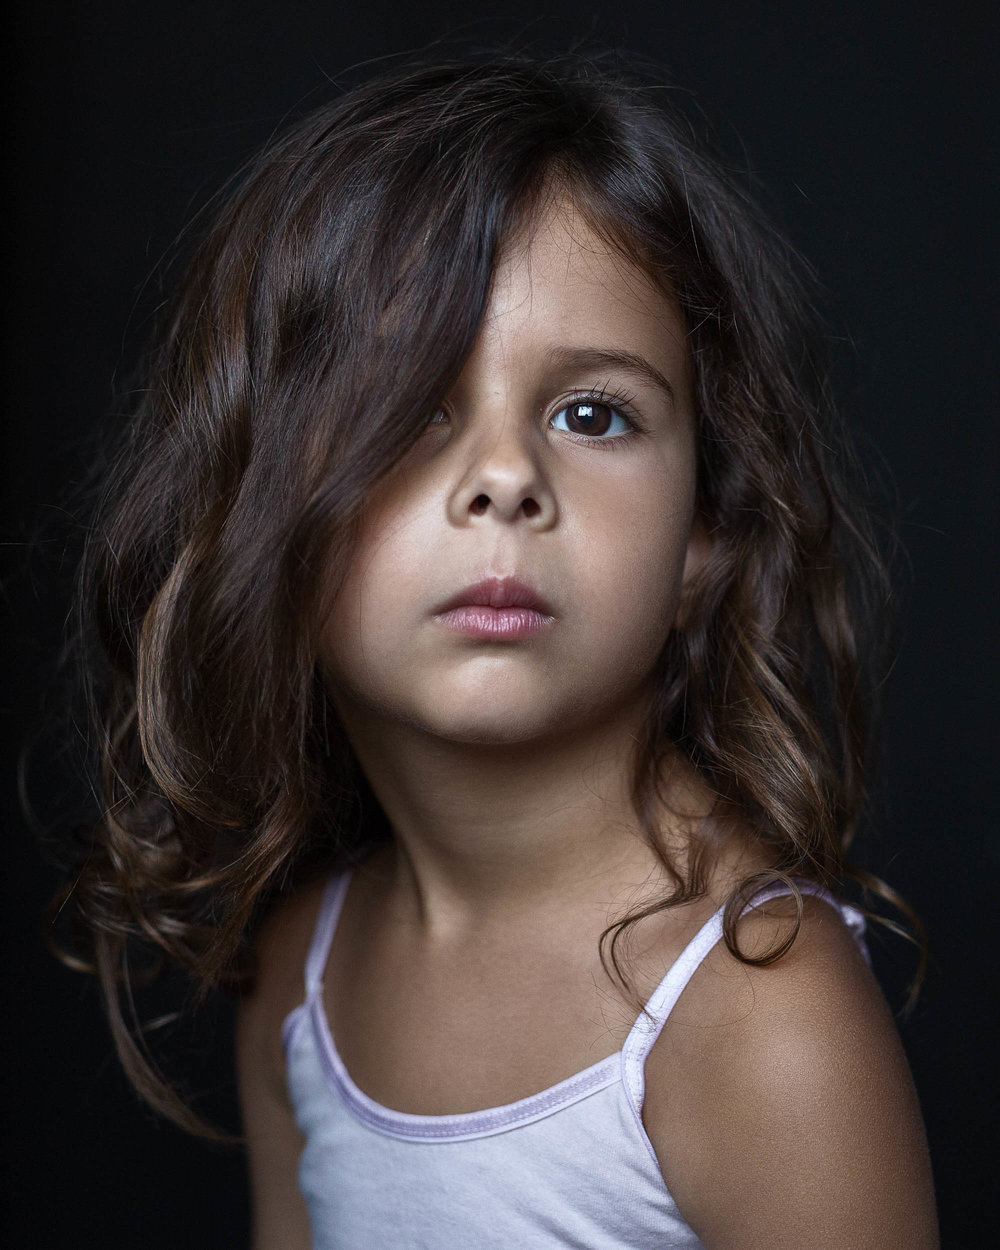 Childrens Portrait taken by Nick Walters at Lumi Studio in Melbourne1.jpg